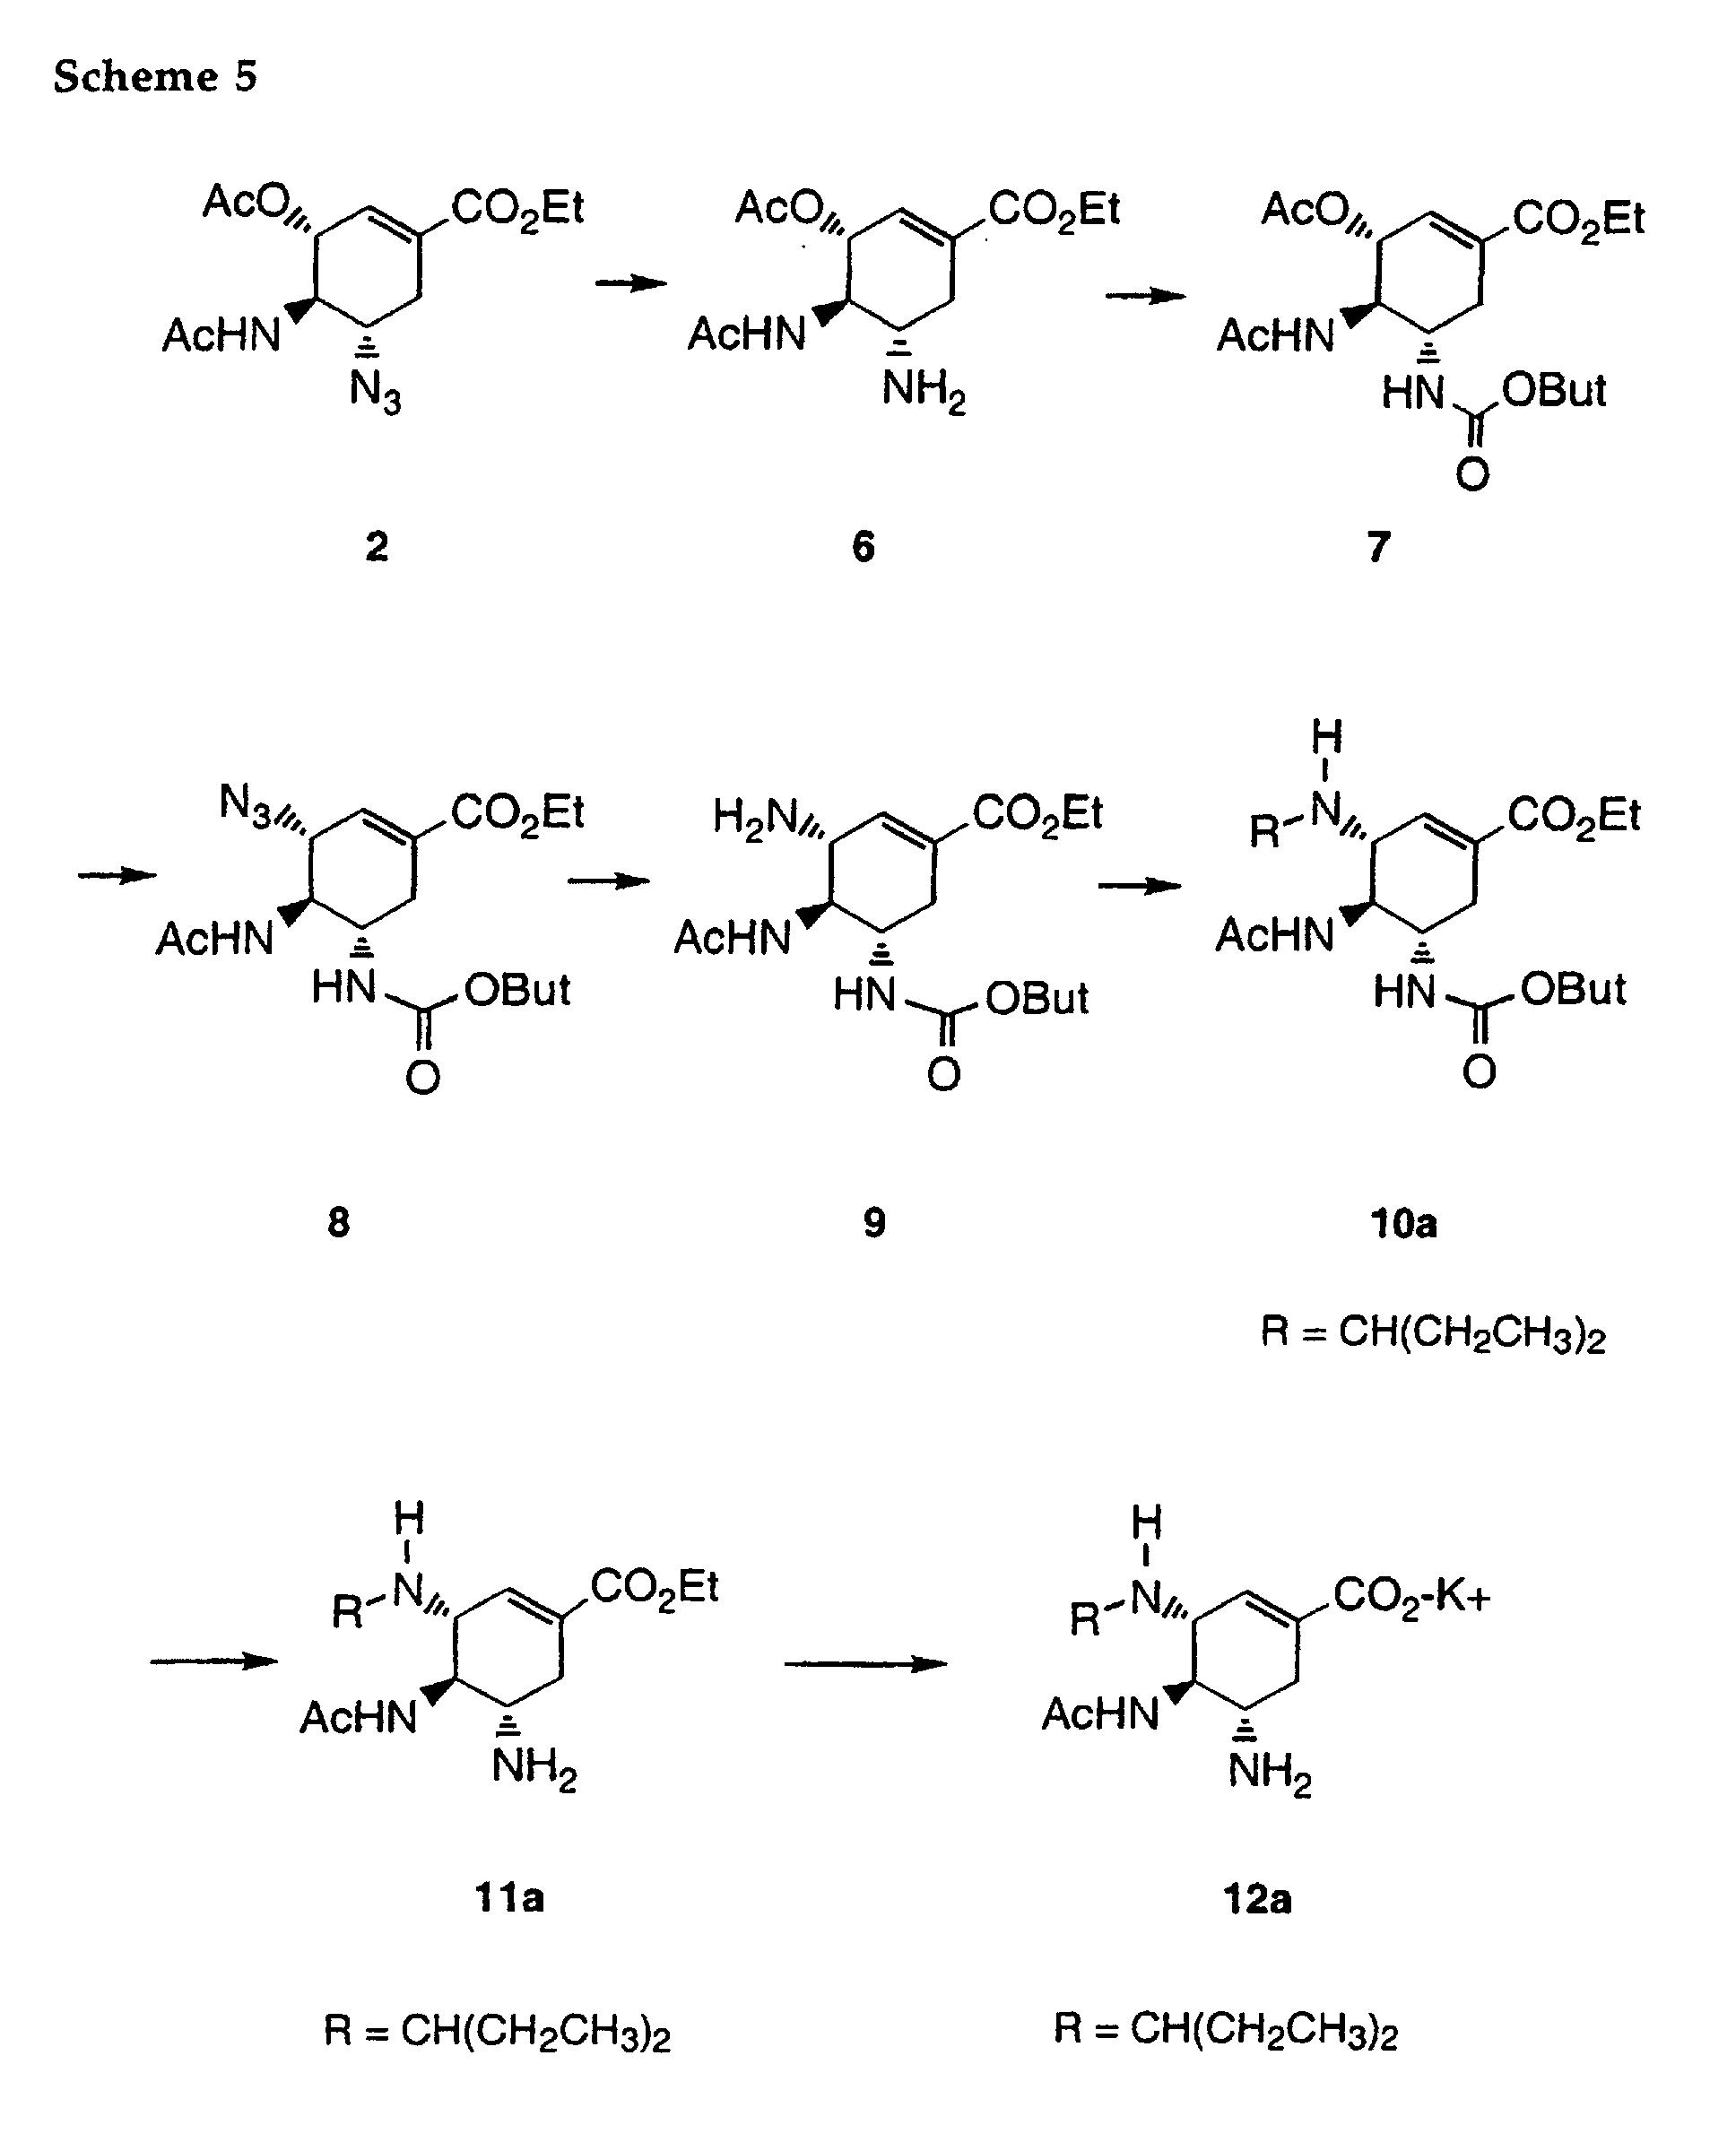 EP1040095B1 - Cyclohexene carboxylates as neuraminidase inhibitors